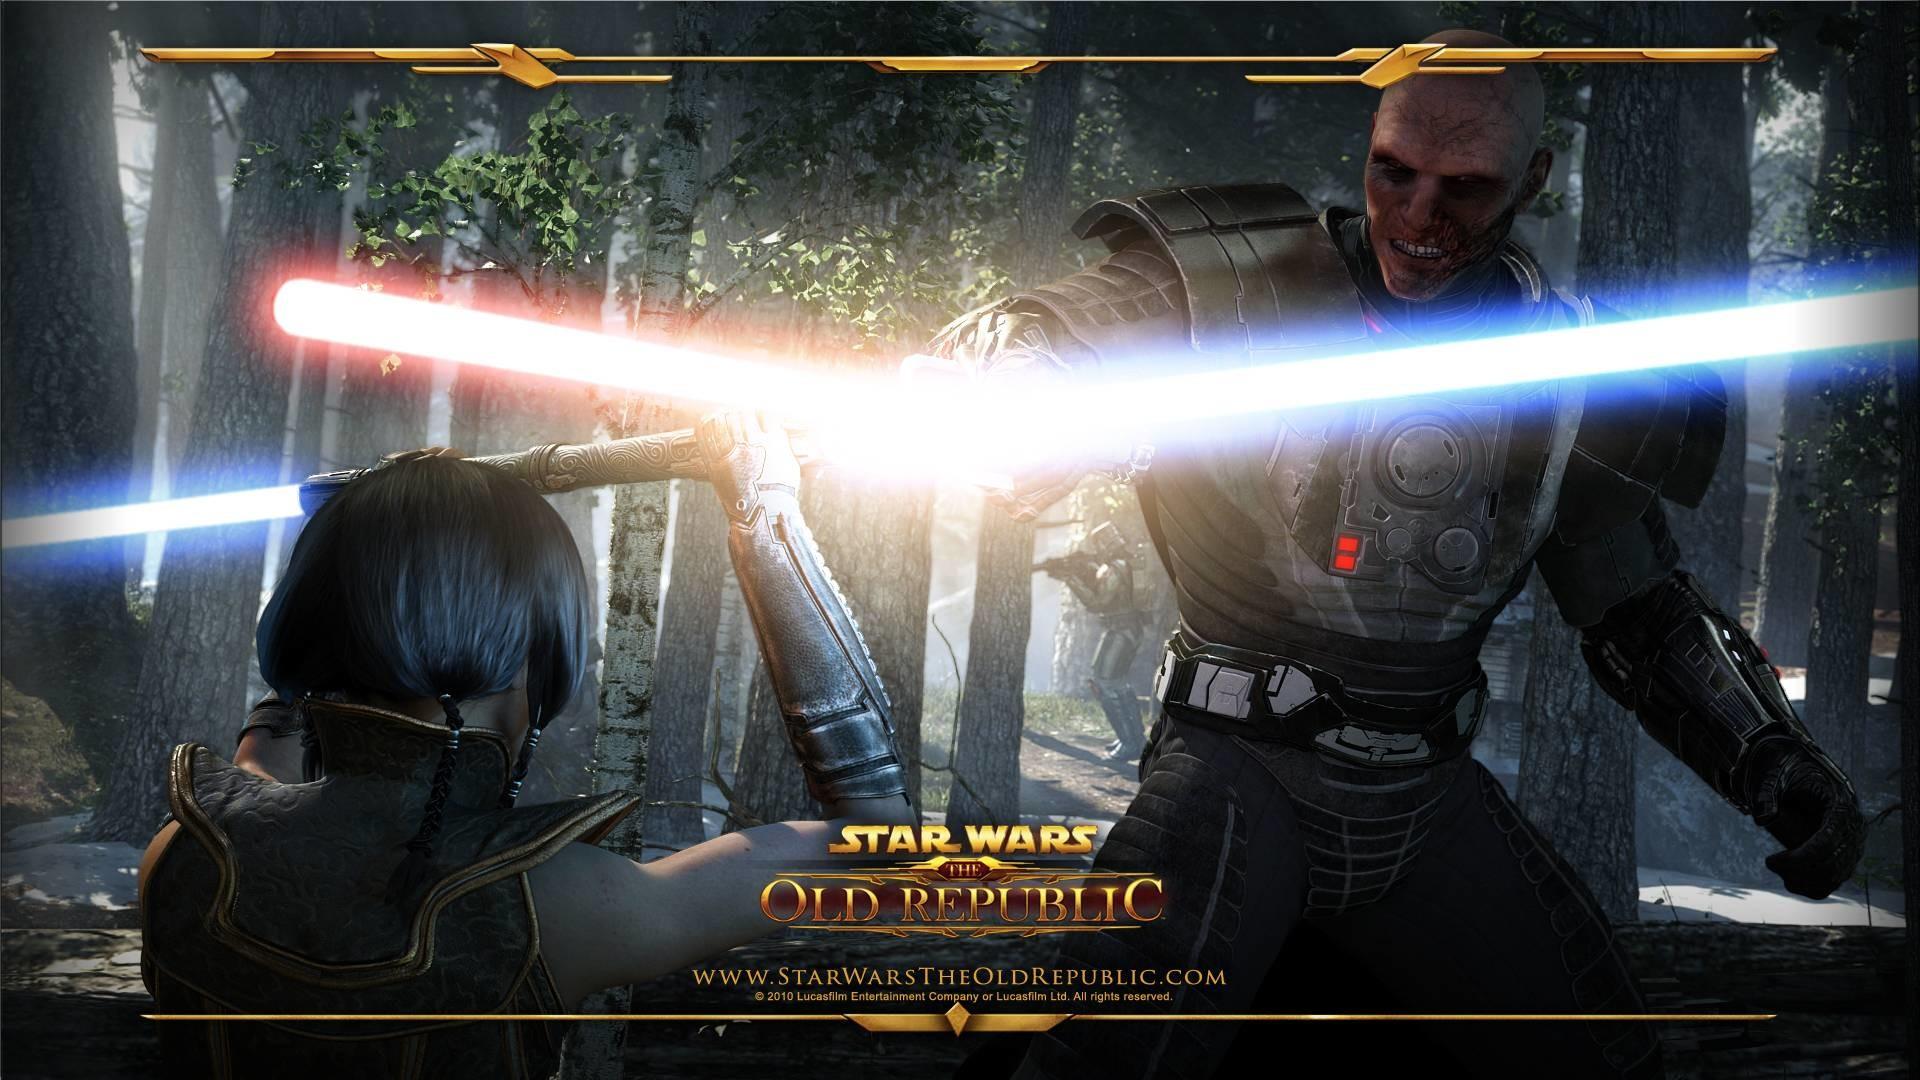 Star Wars the Old Republic wallpaper 32